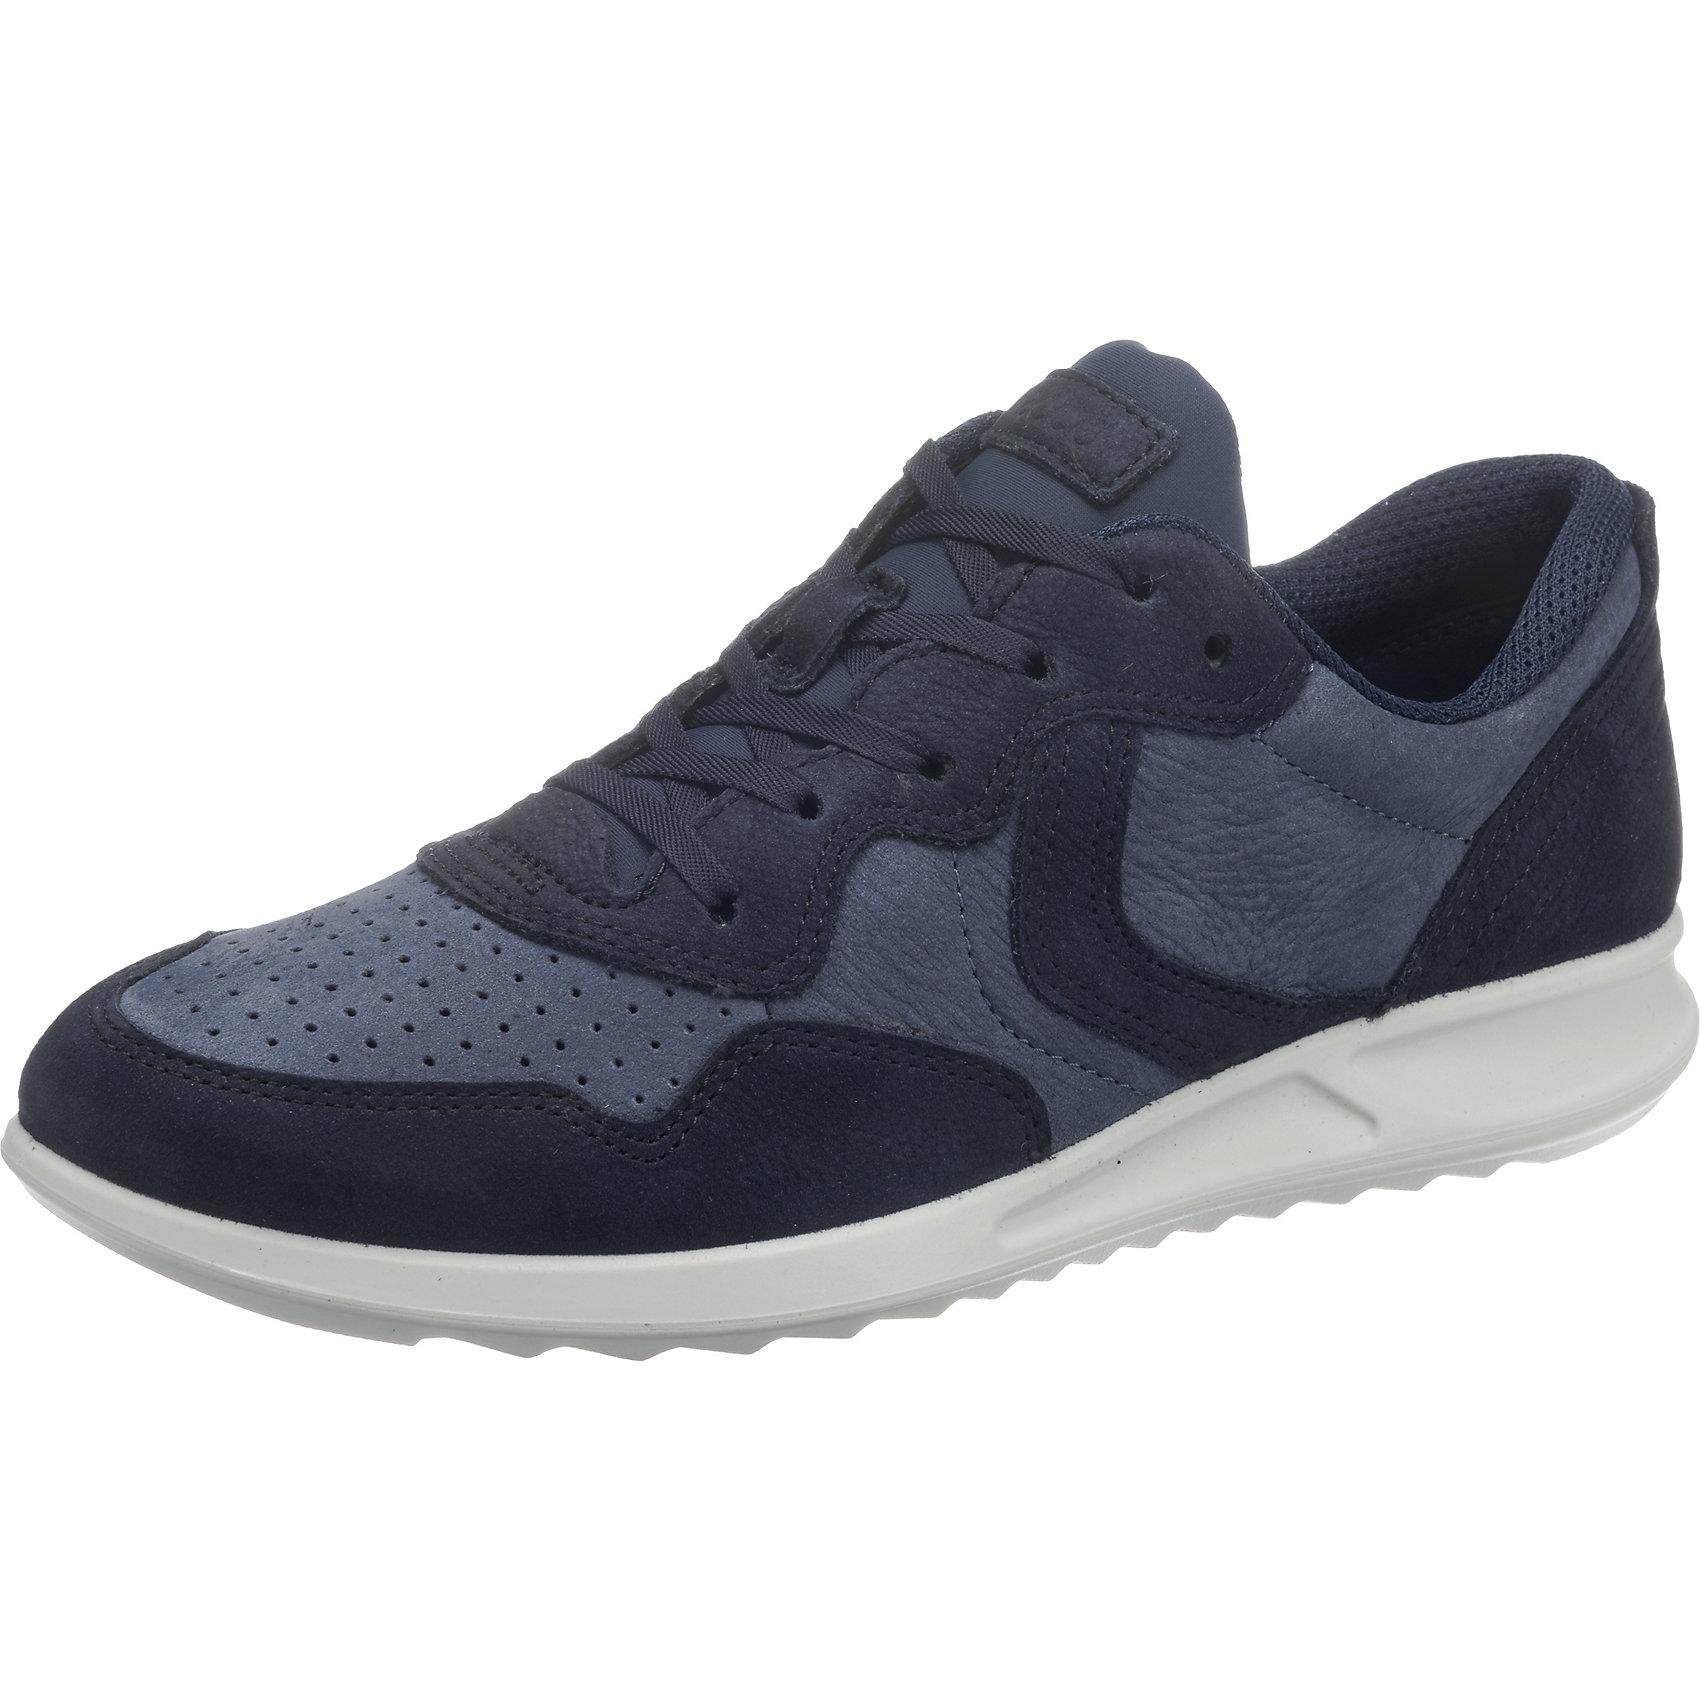 Für Black Neu Damen Soft 7406748 5 Feather Low Sneakers Blau Ecco 8q8Orxf